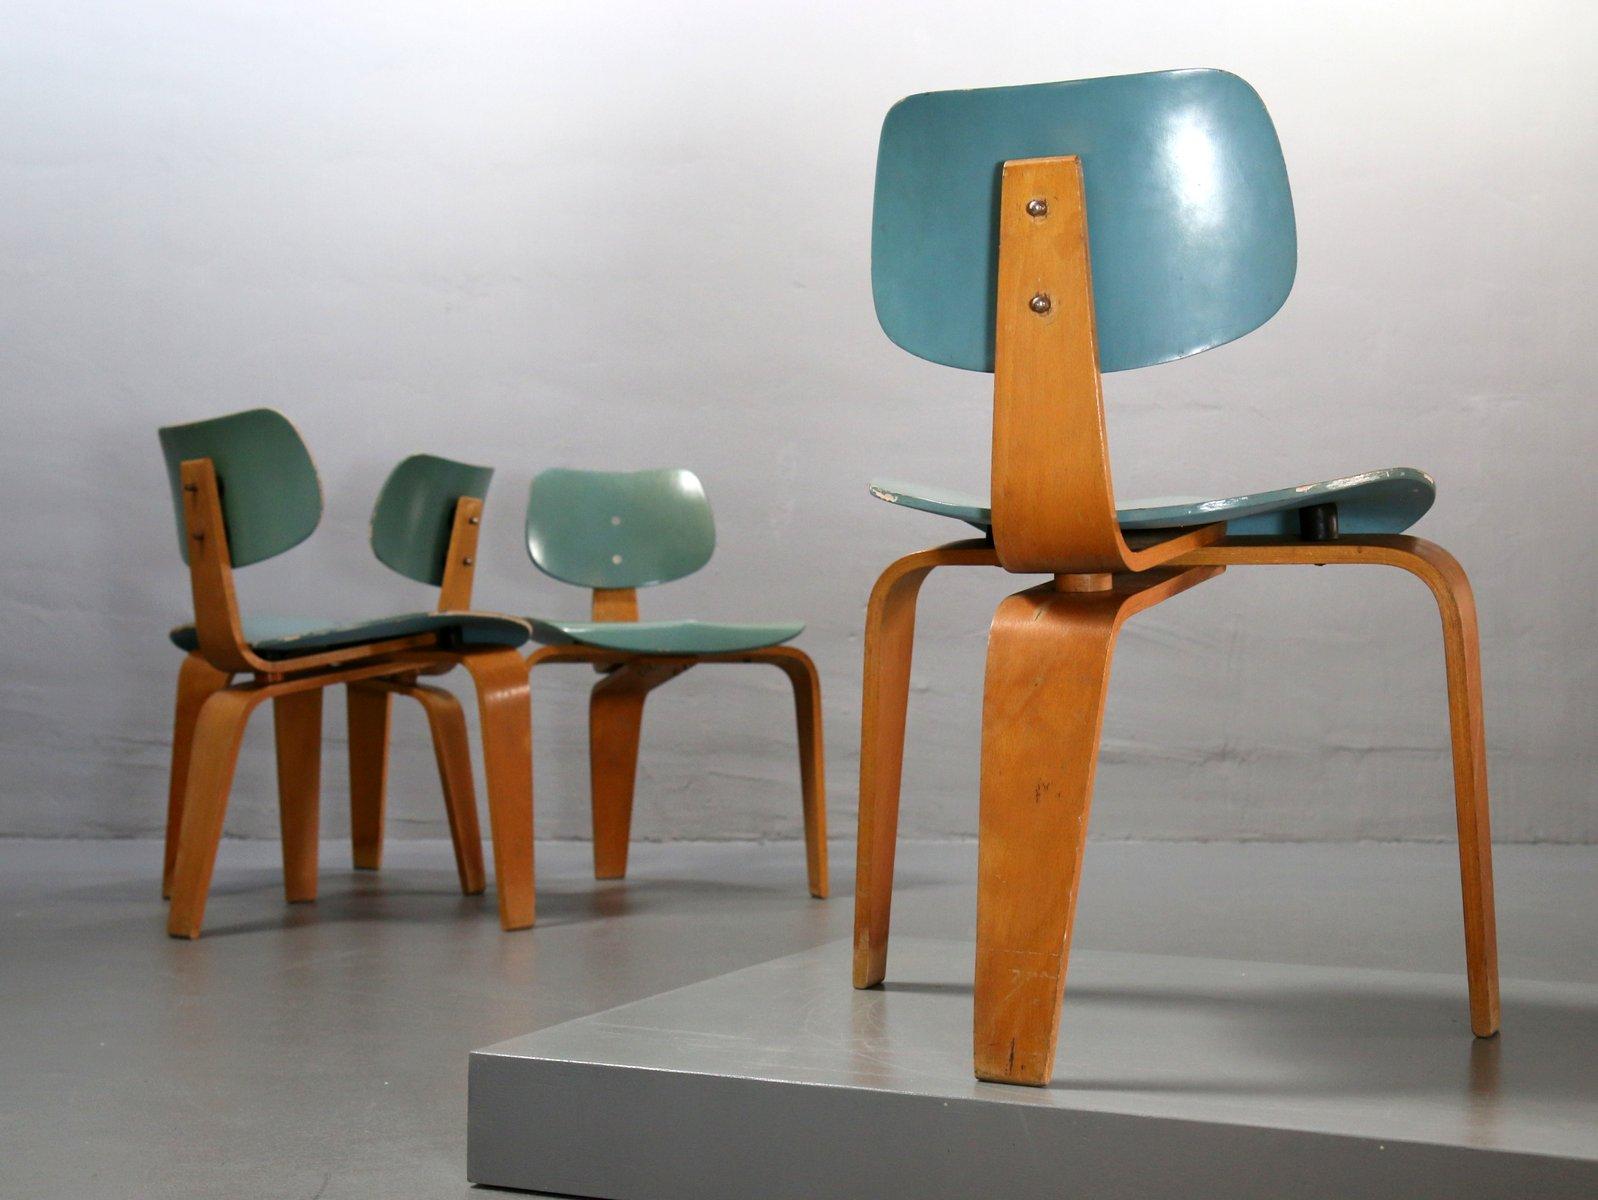 Tavolo da pranzo con sedie vintage di egon eiermann per - Sedie per tavolo pranzo ...